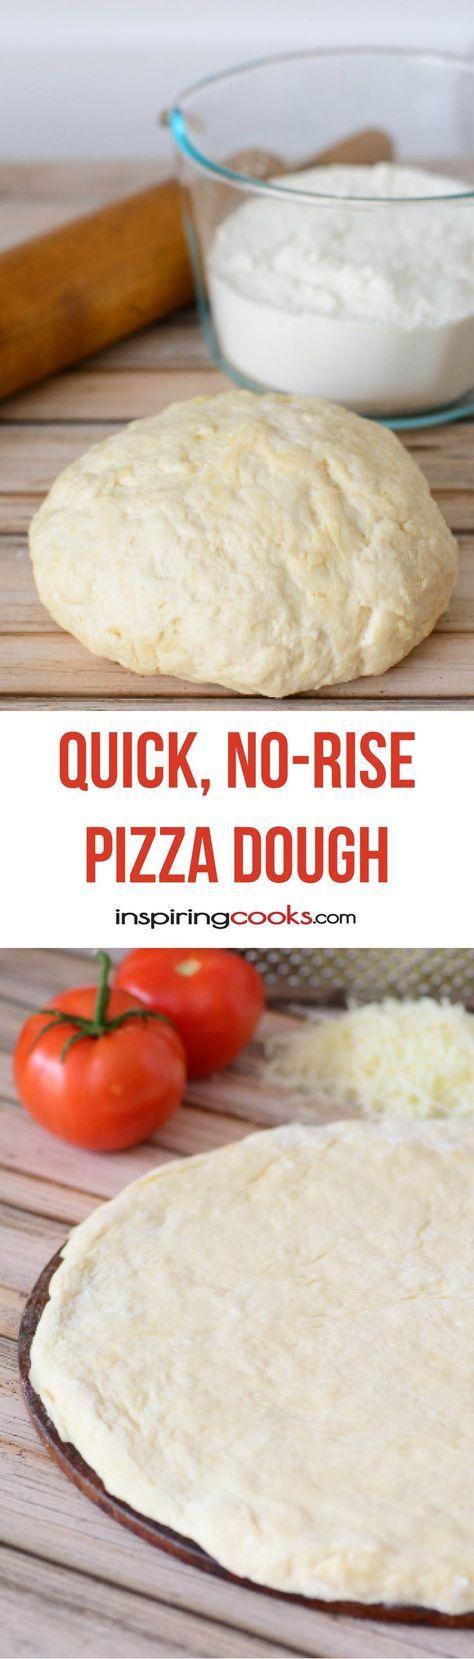 Pizza hut vegan dough